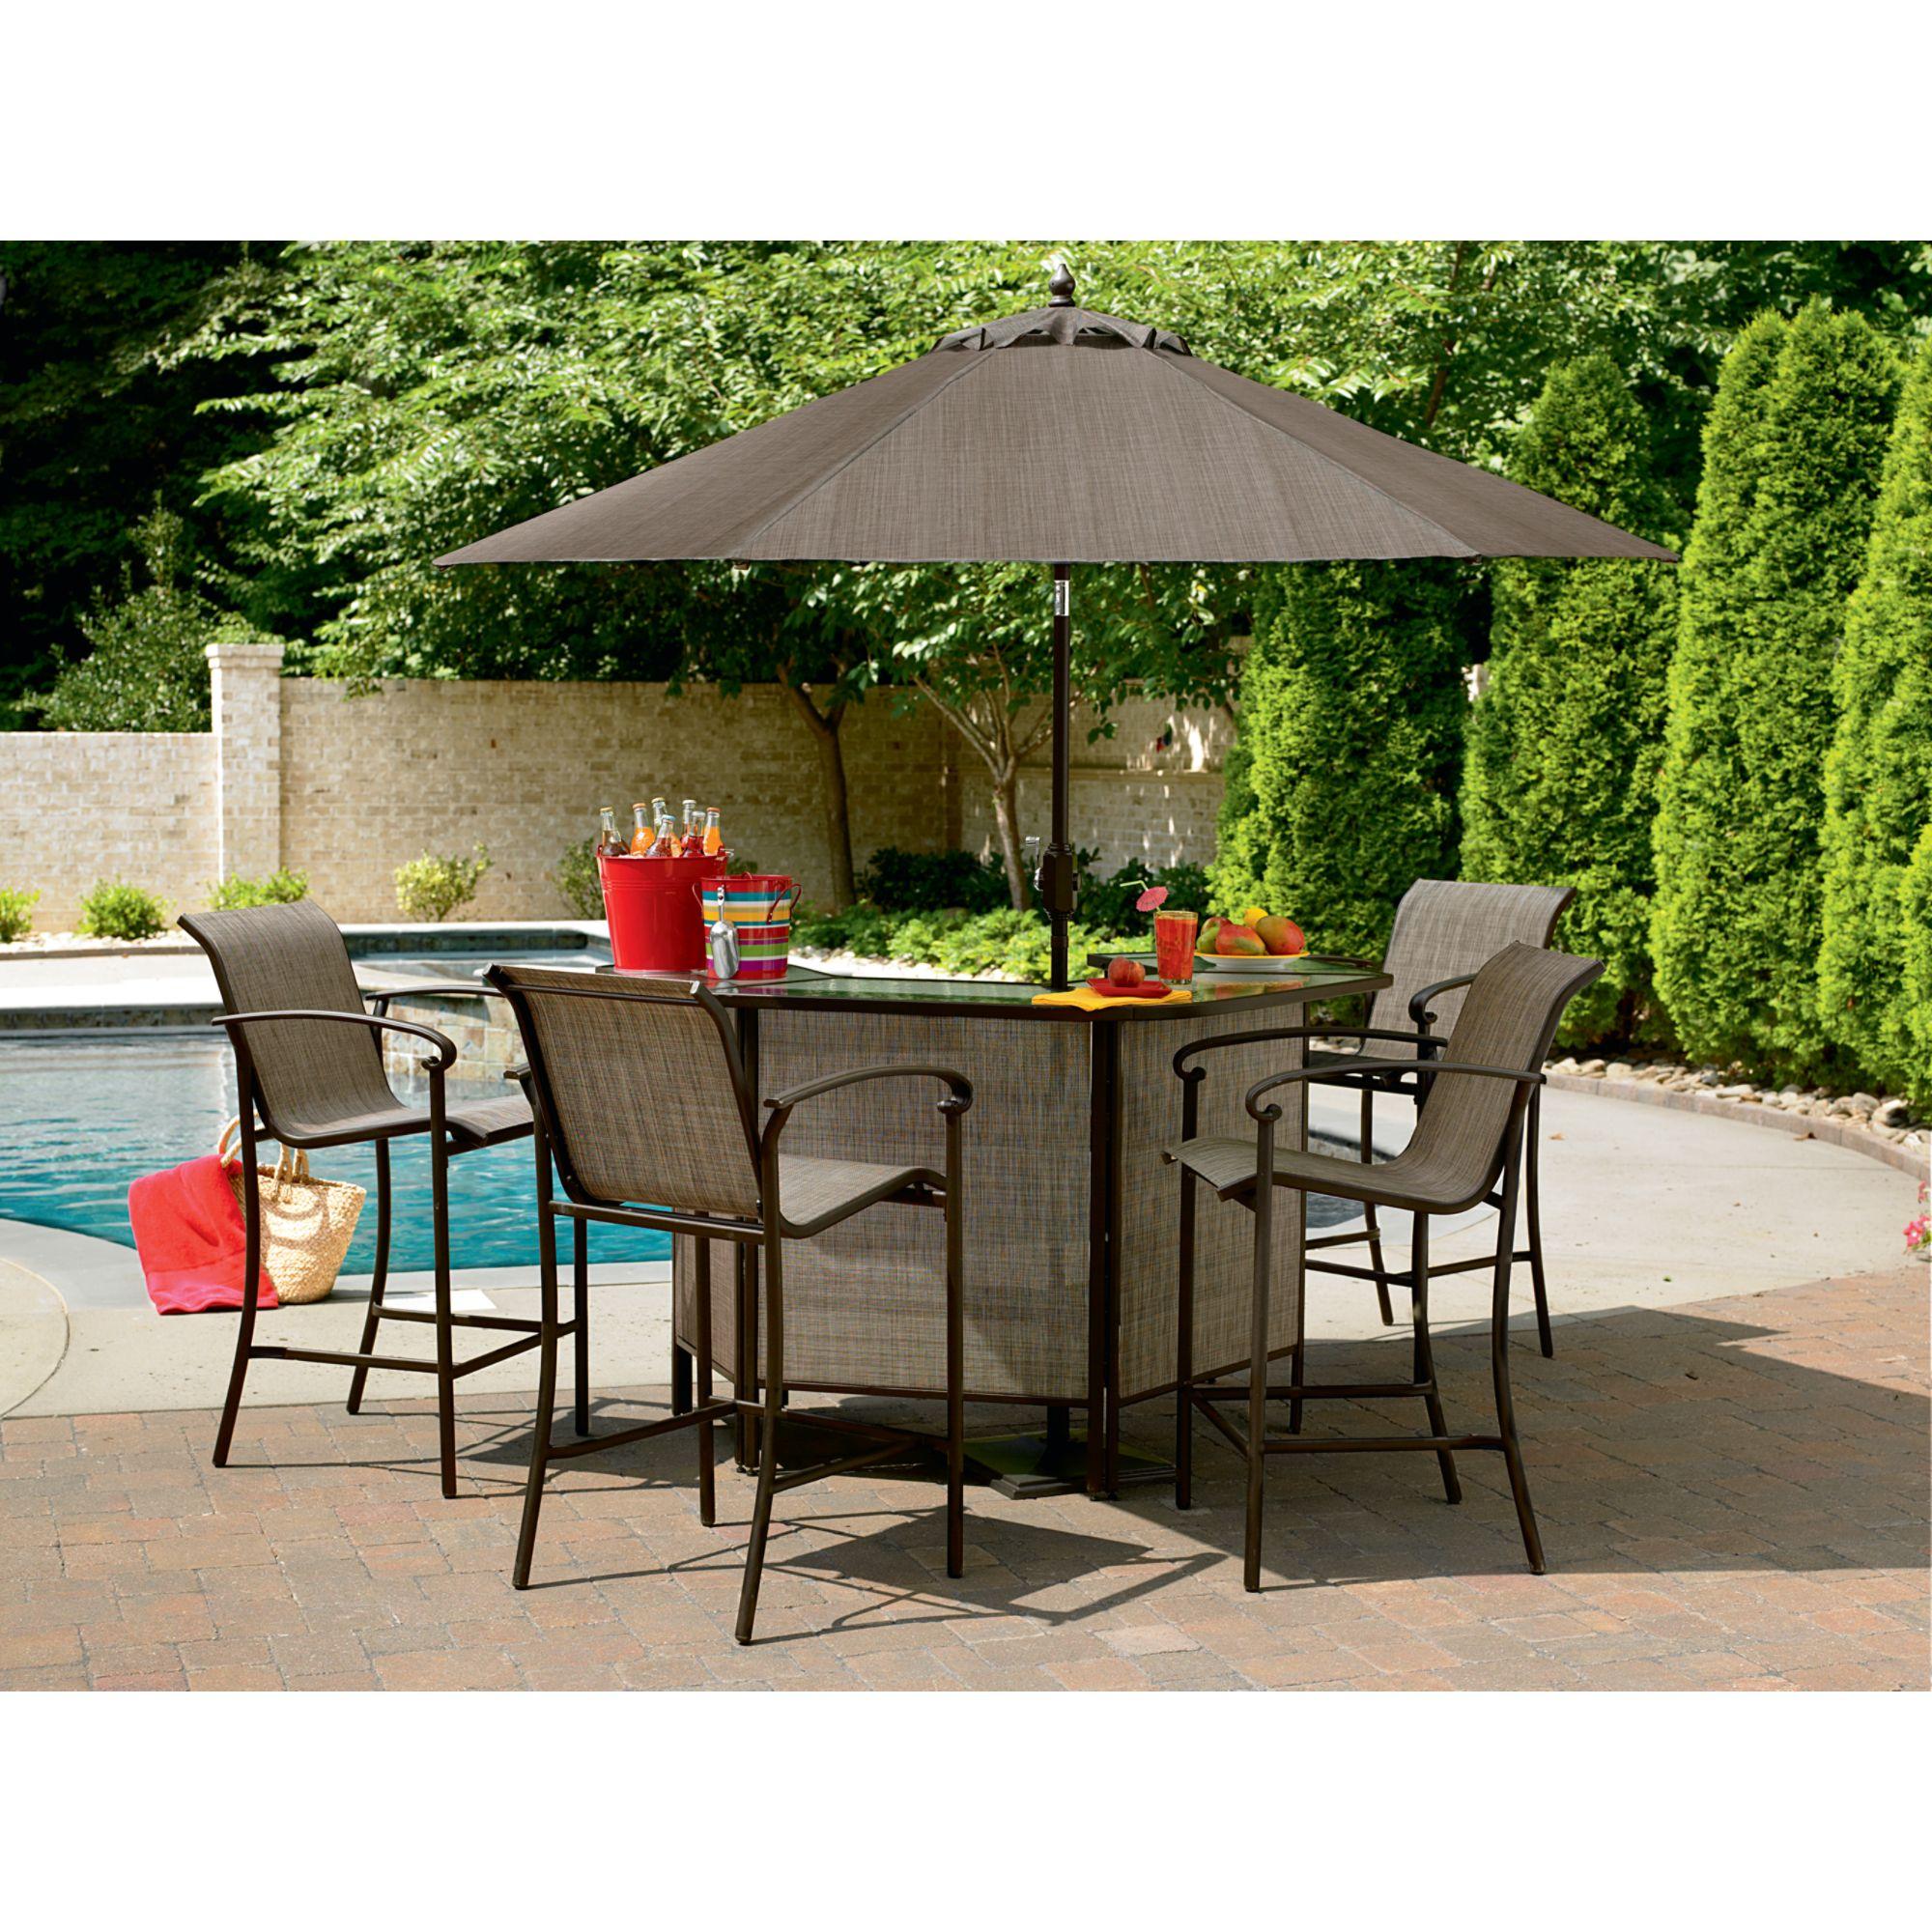 Charming Garden Oasis Garden Oasis East Point 5 Pc. Bar Set